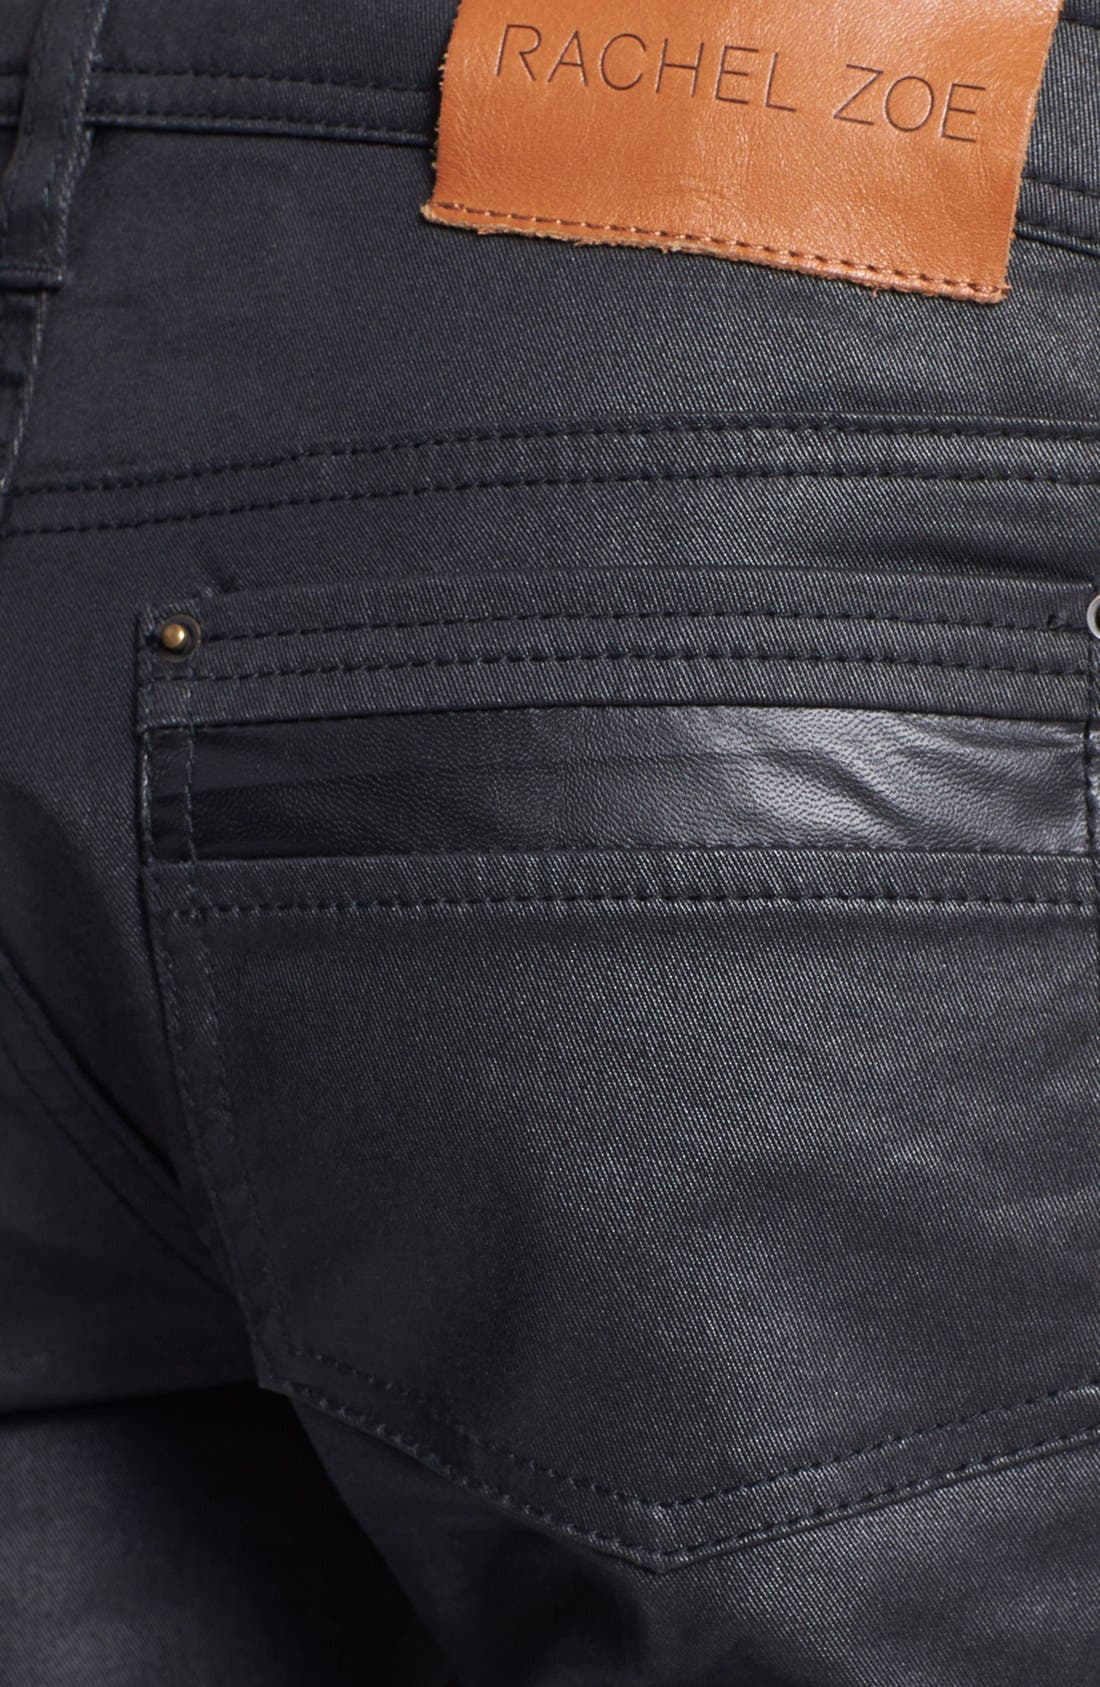 Alternate Image 3  - Rachel Zoe 'Julie' Skinny High Gloss Coated Jeans